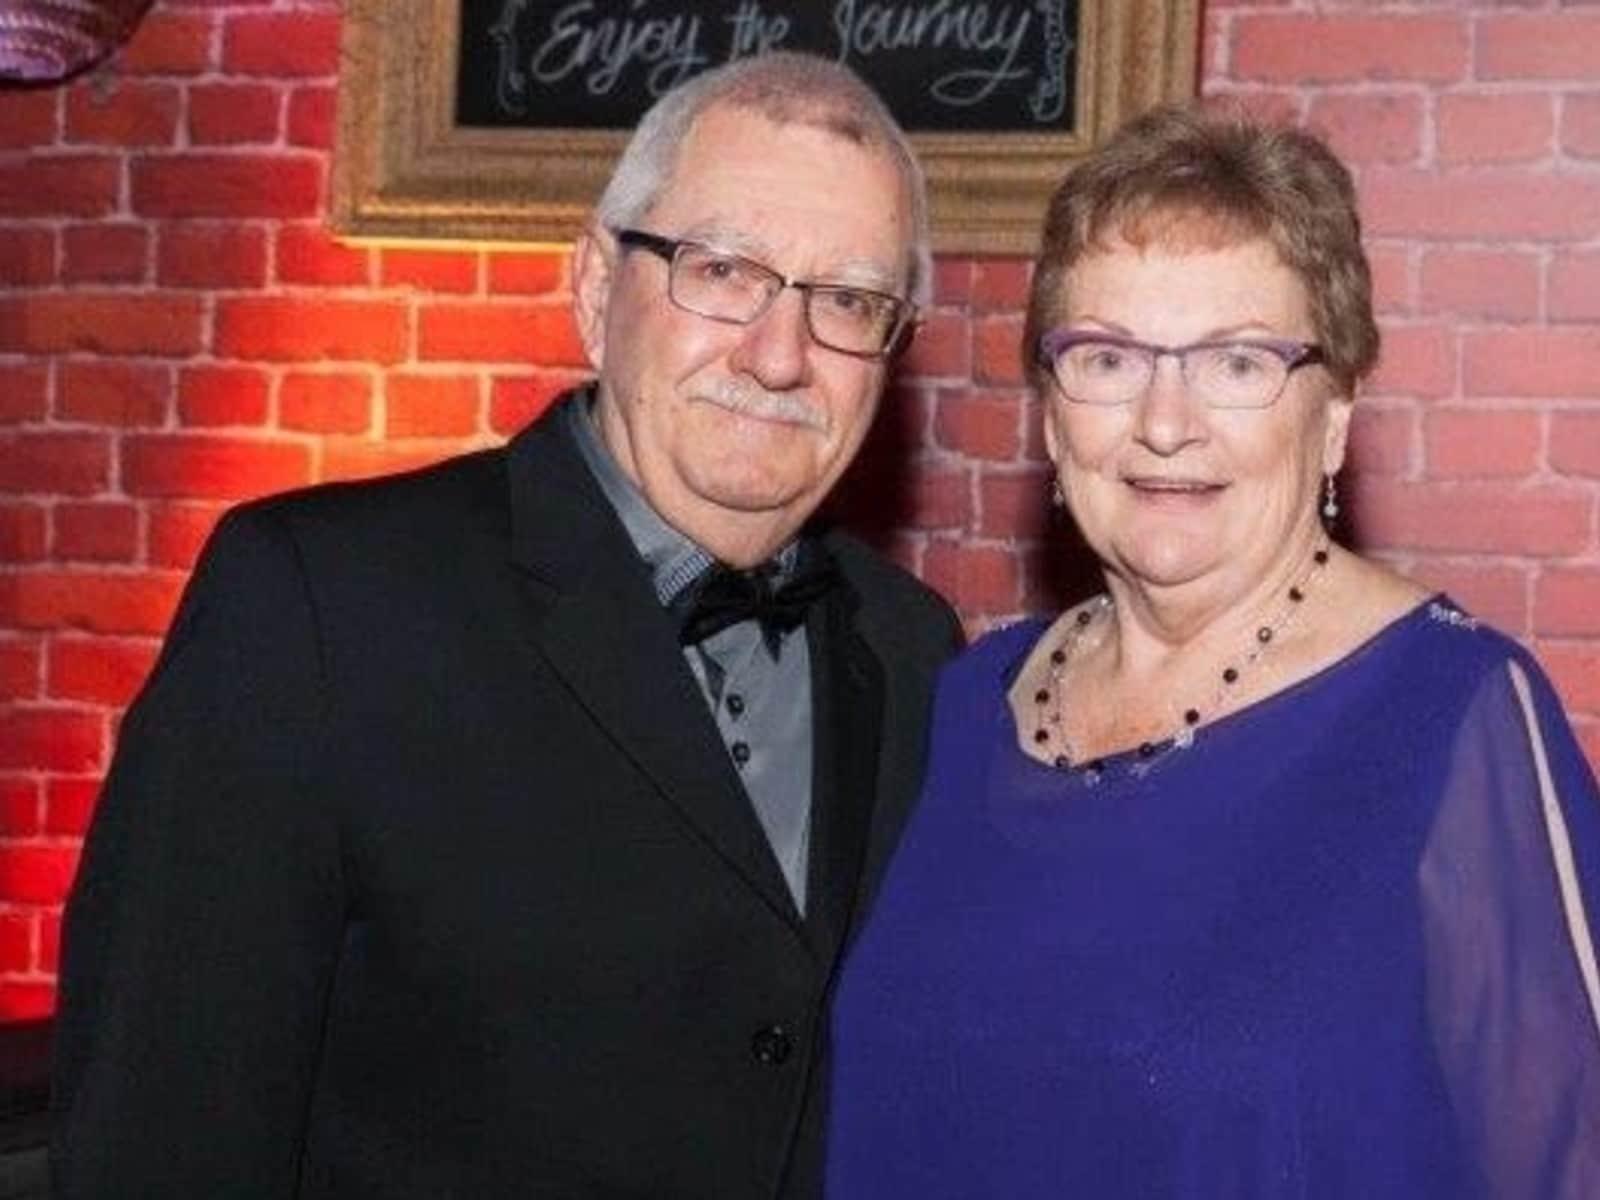 Margaret & Gregory from Ferring, United Kingdom